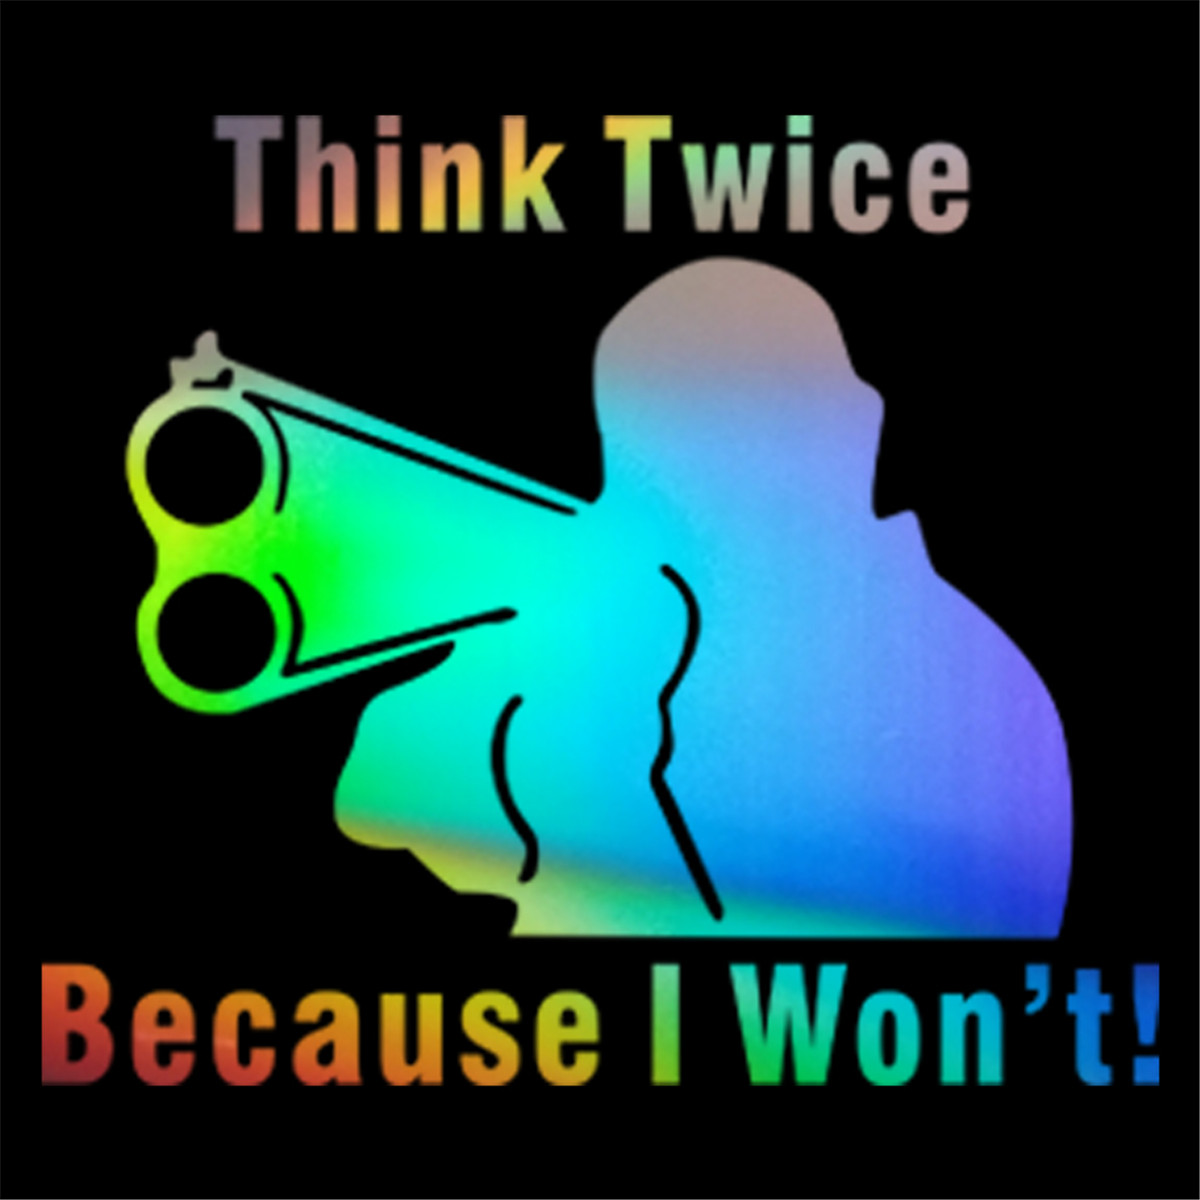 Think Twice Because I Won/'t Gun Vinyl Decal Sticker Car Truck Home Security